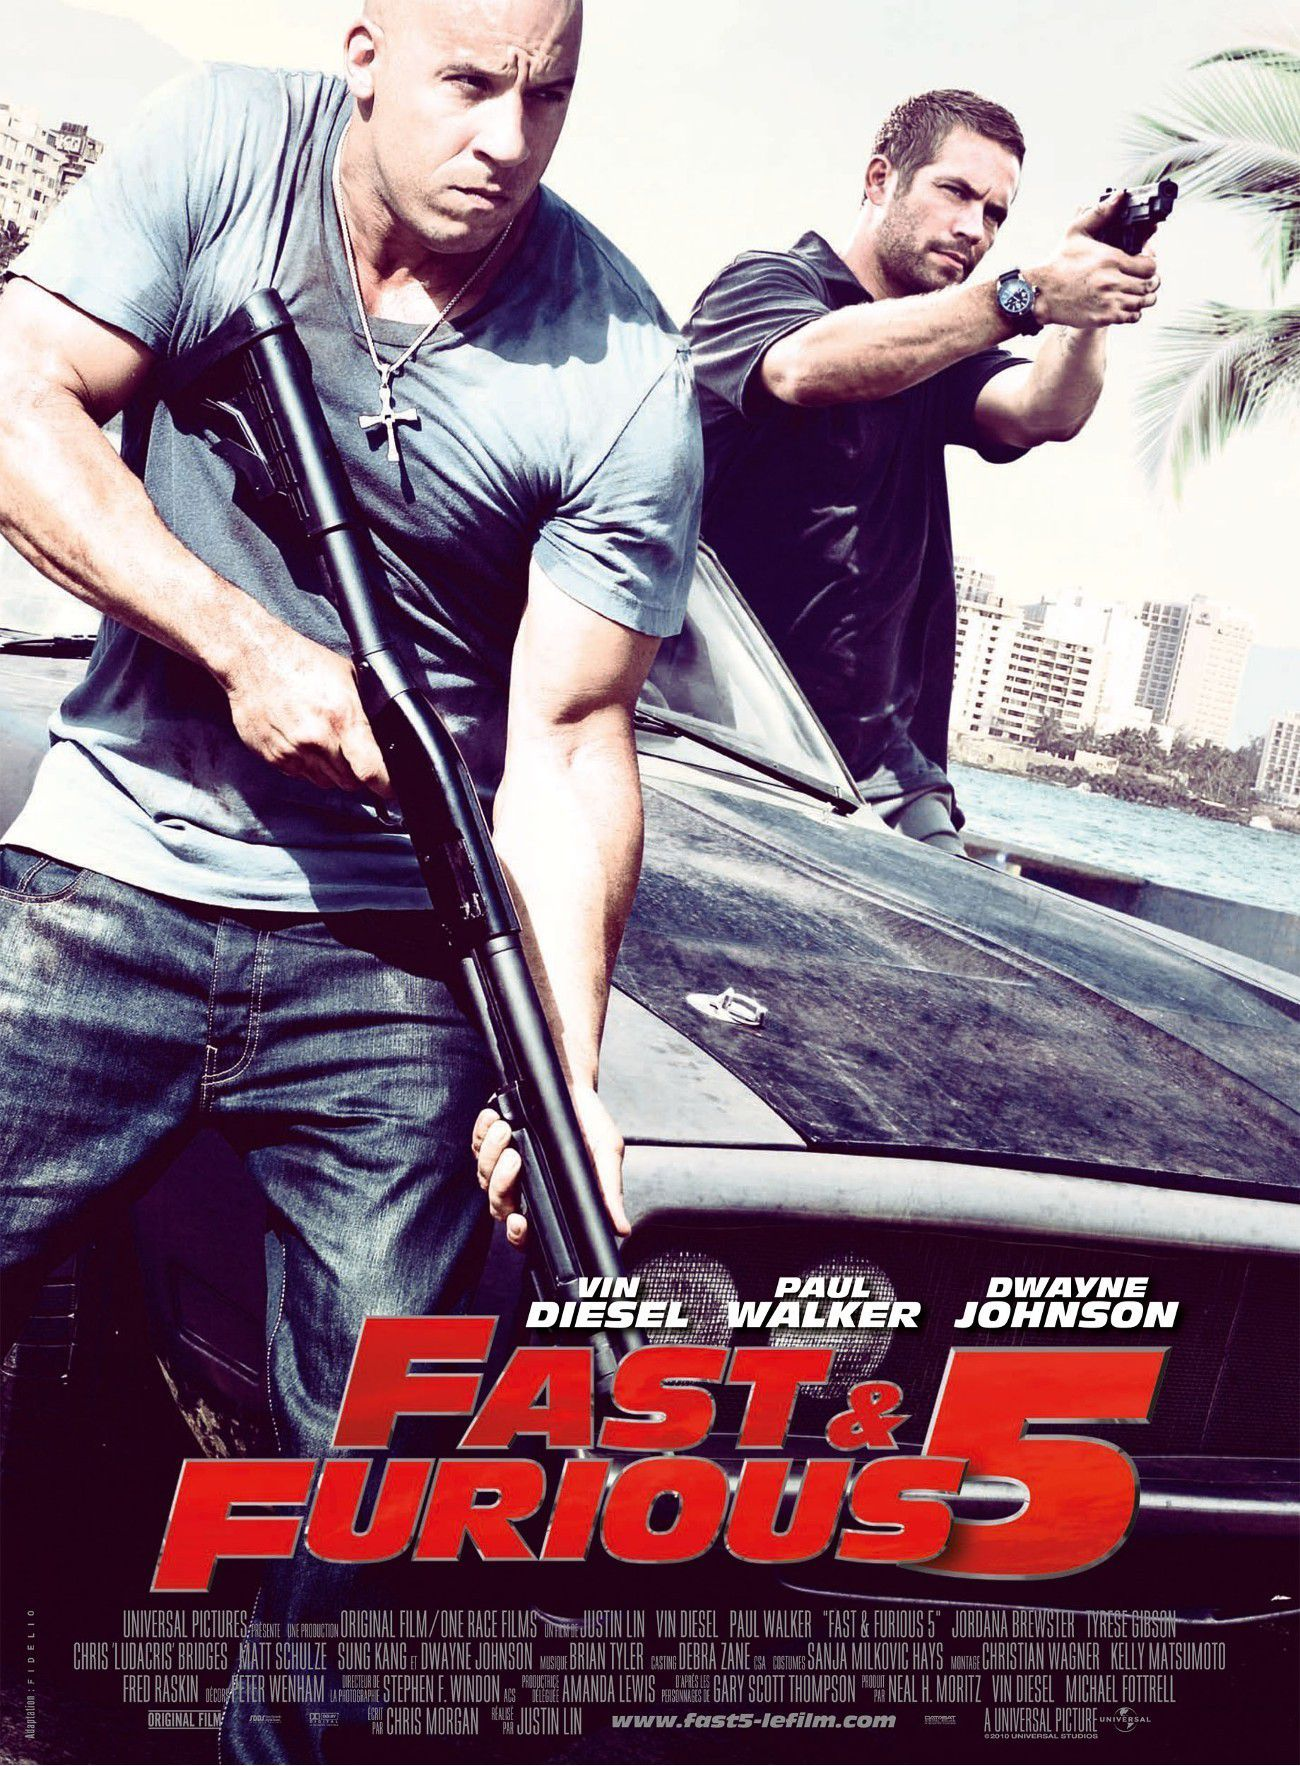 Fast & Furious 5 - Film (2011)